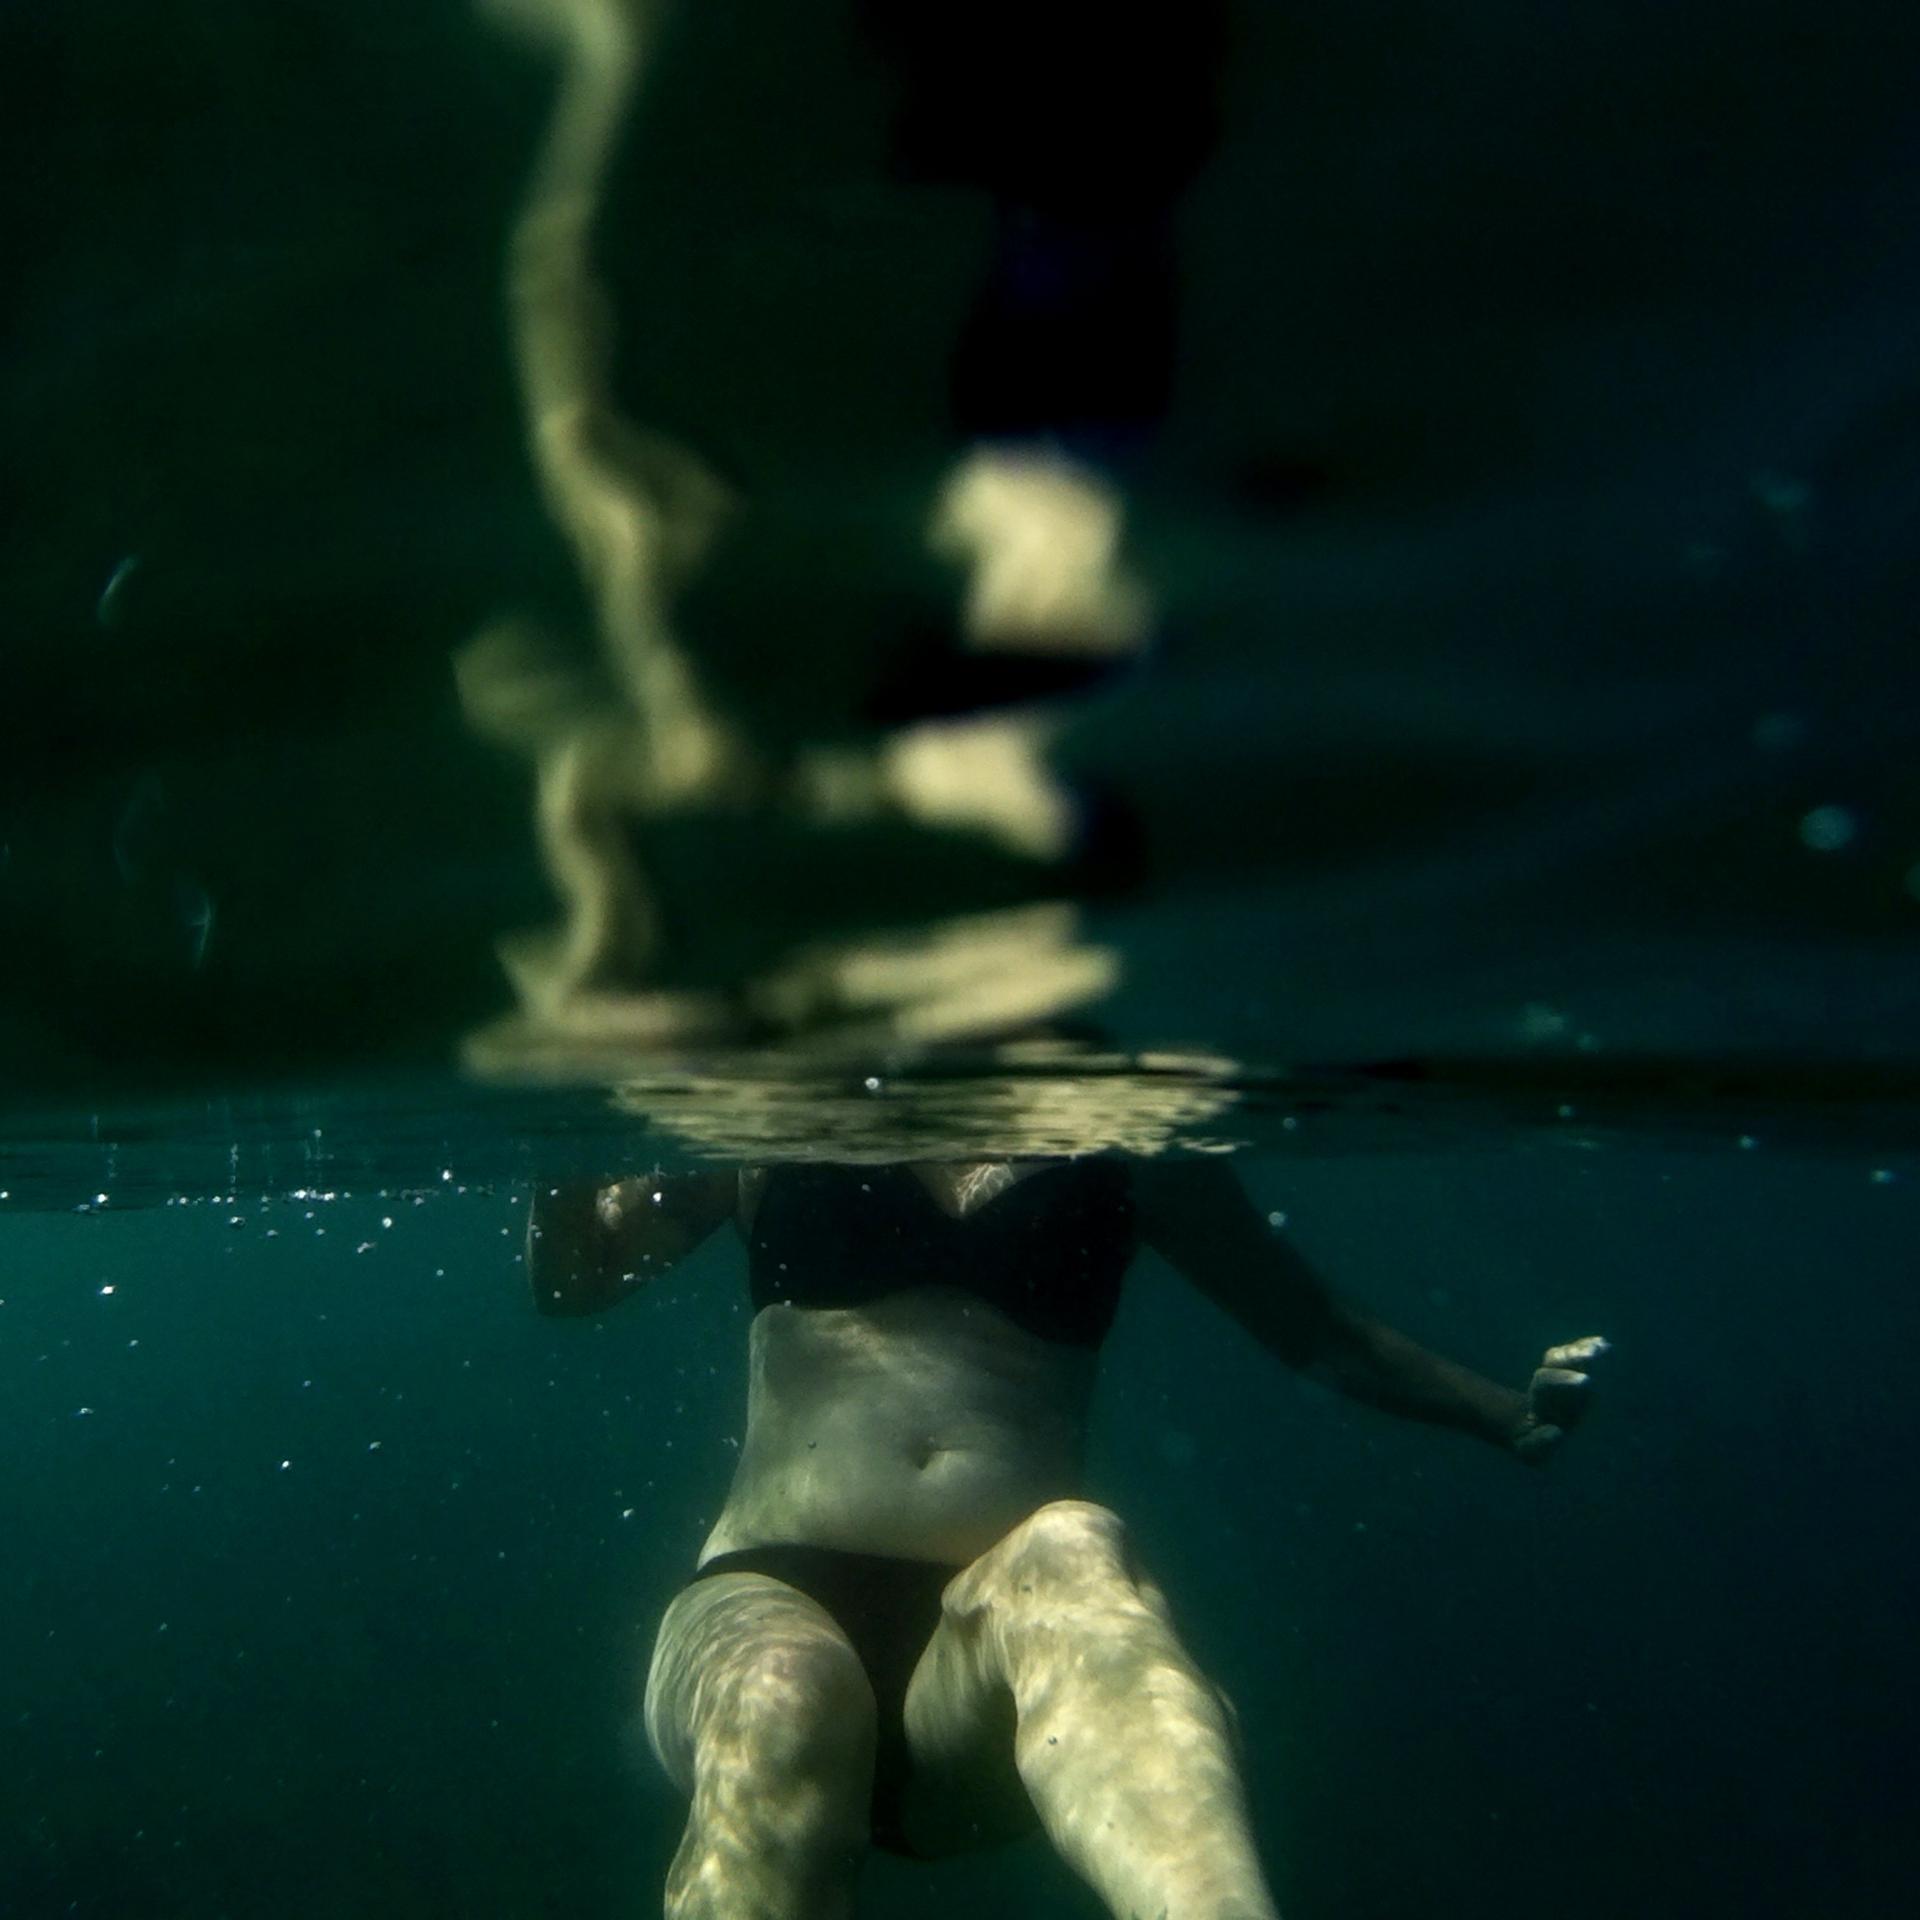 Underwater melancholy